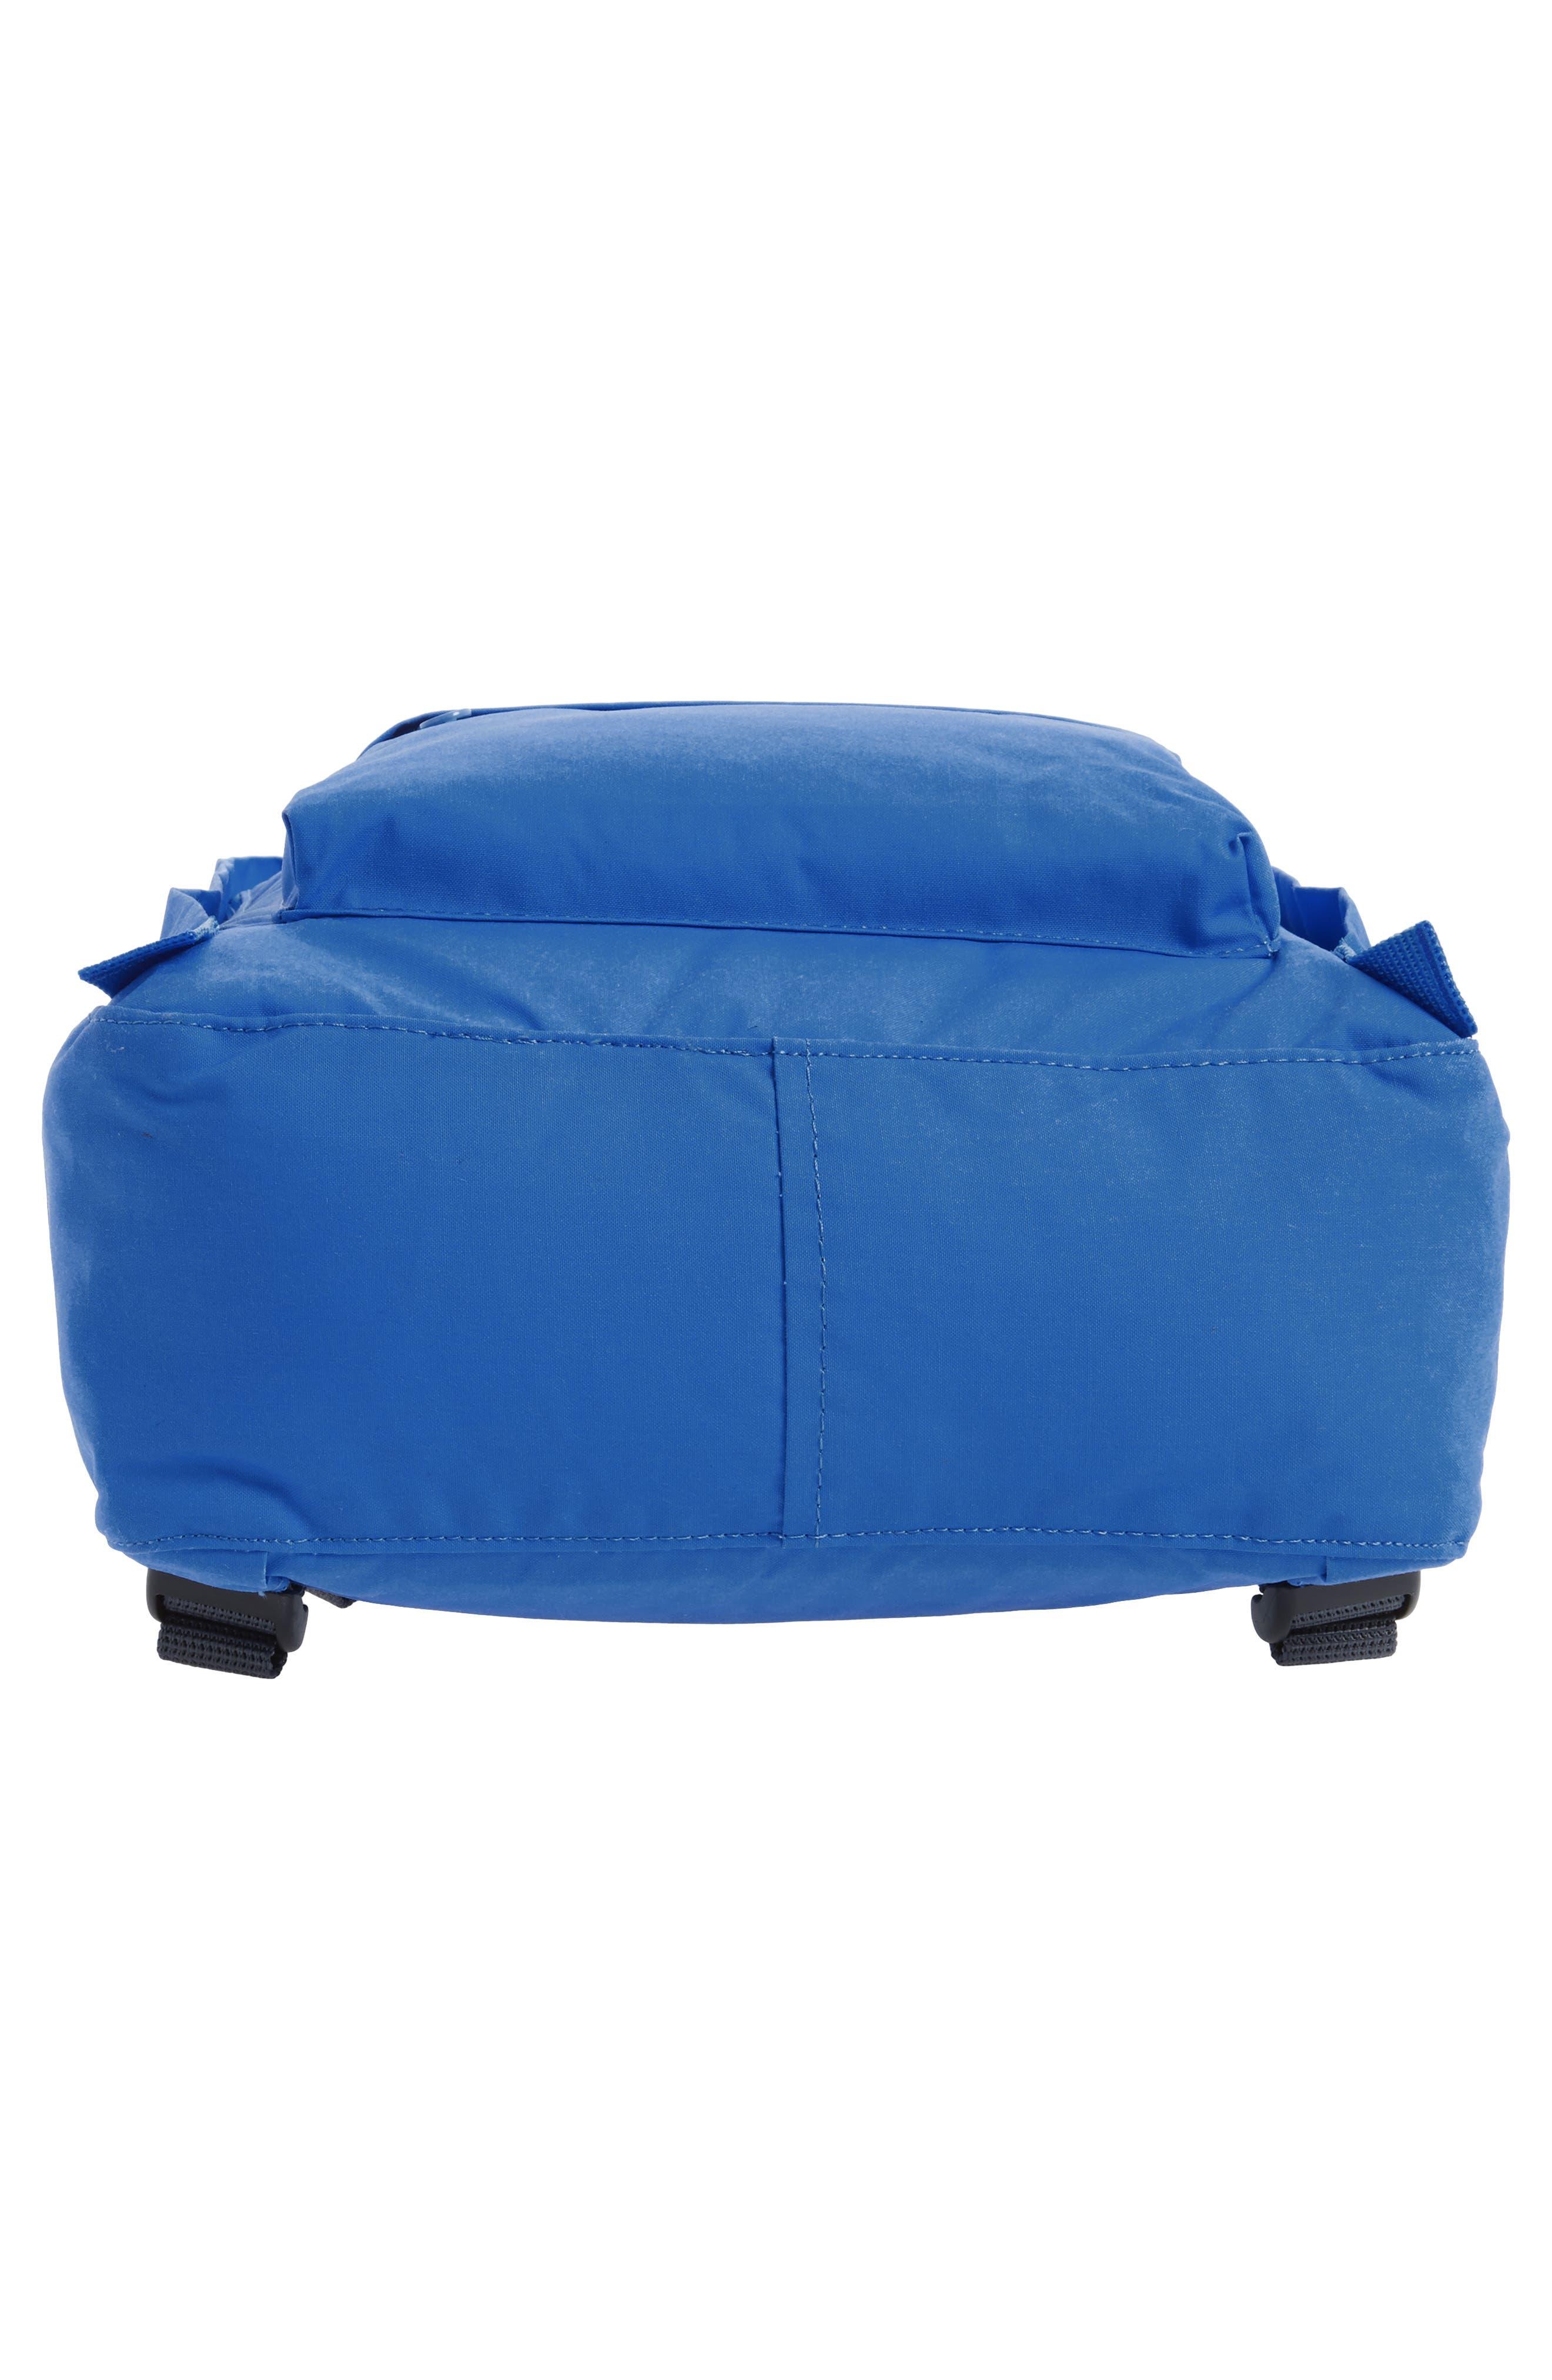 'Kånken' Water Resistant Backpack,                             Alternate thumbnail 335, color,